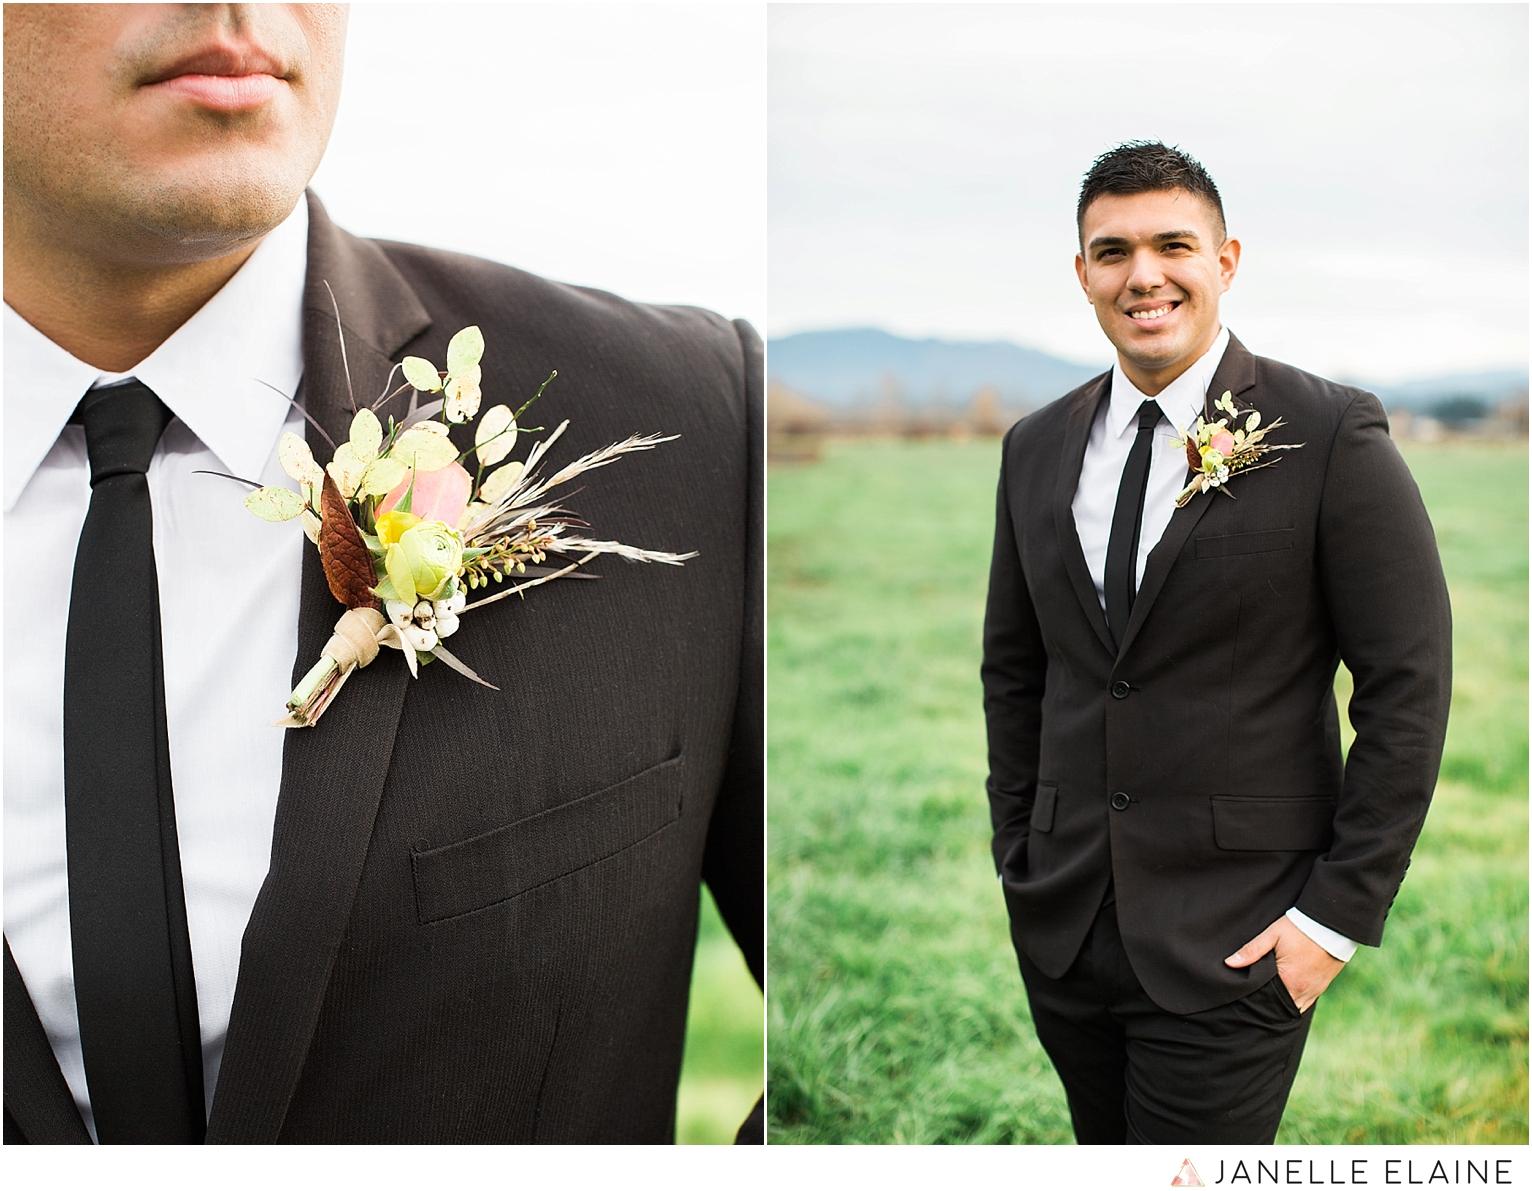 elopement-wedding-photographer-seattle washington-photographers-51.jpg